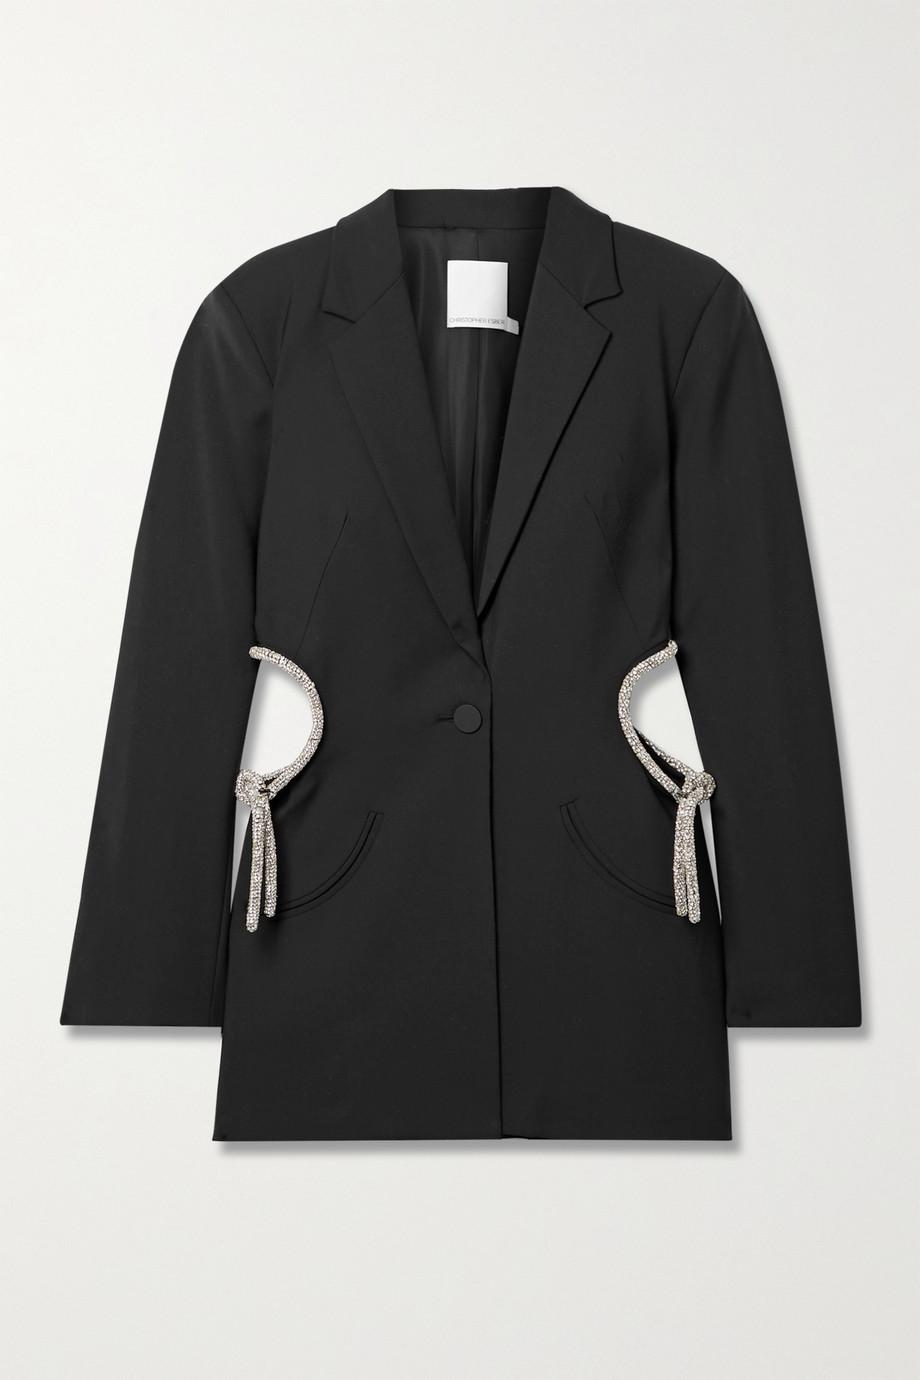 Christopher Esber 水晶缀饰挖剪羊毛混纺西装外套